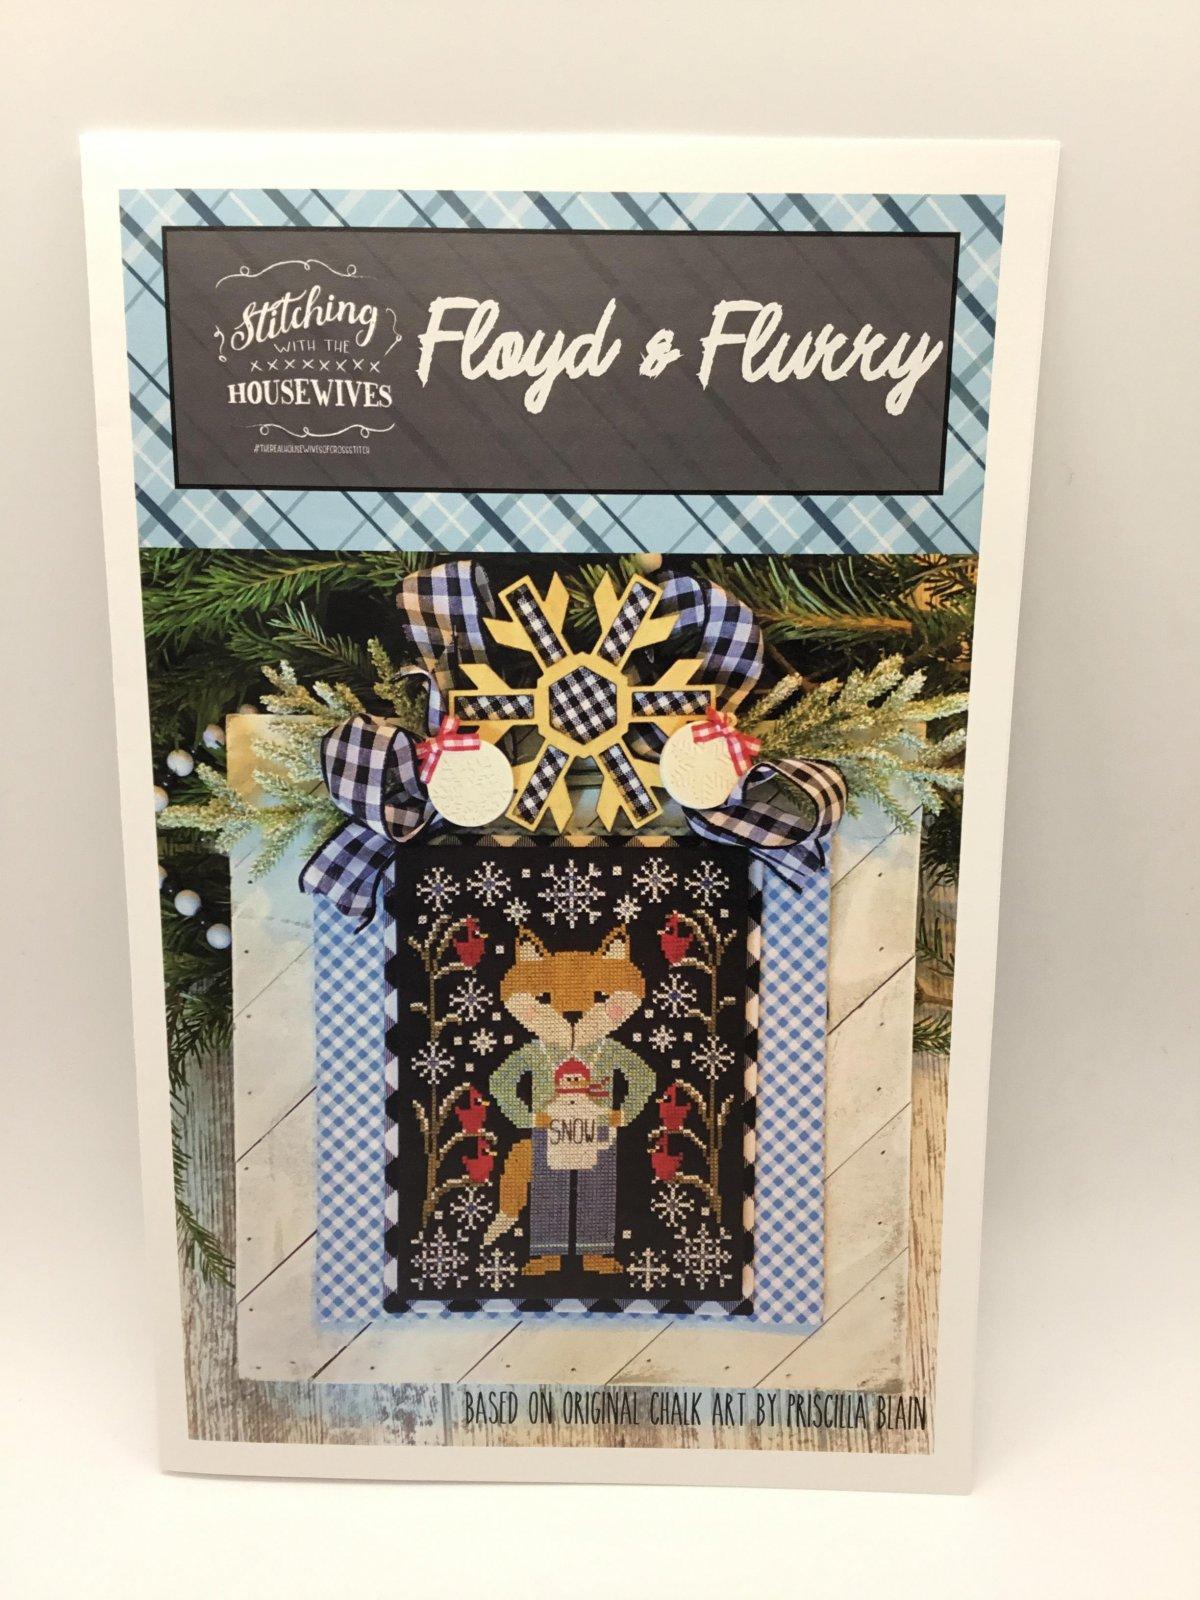 Floyd & Flurry